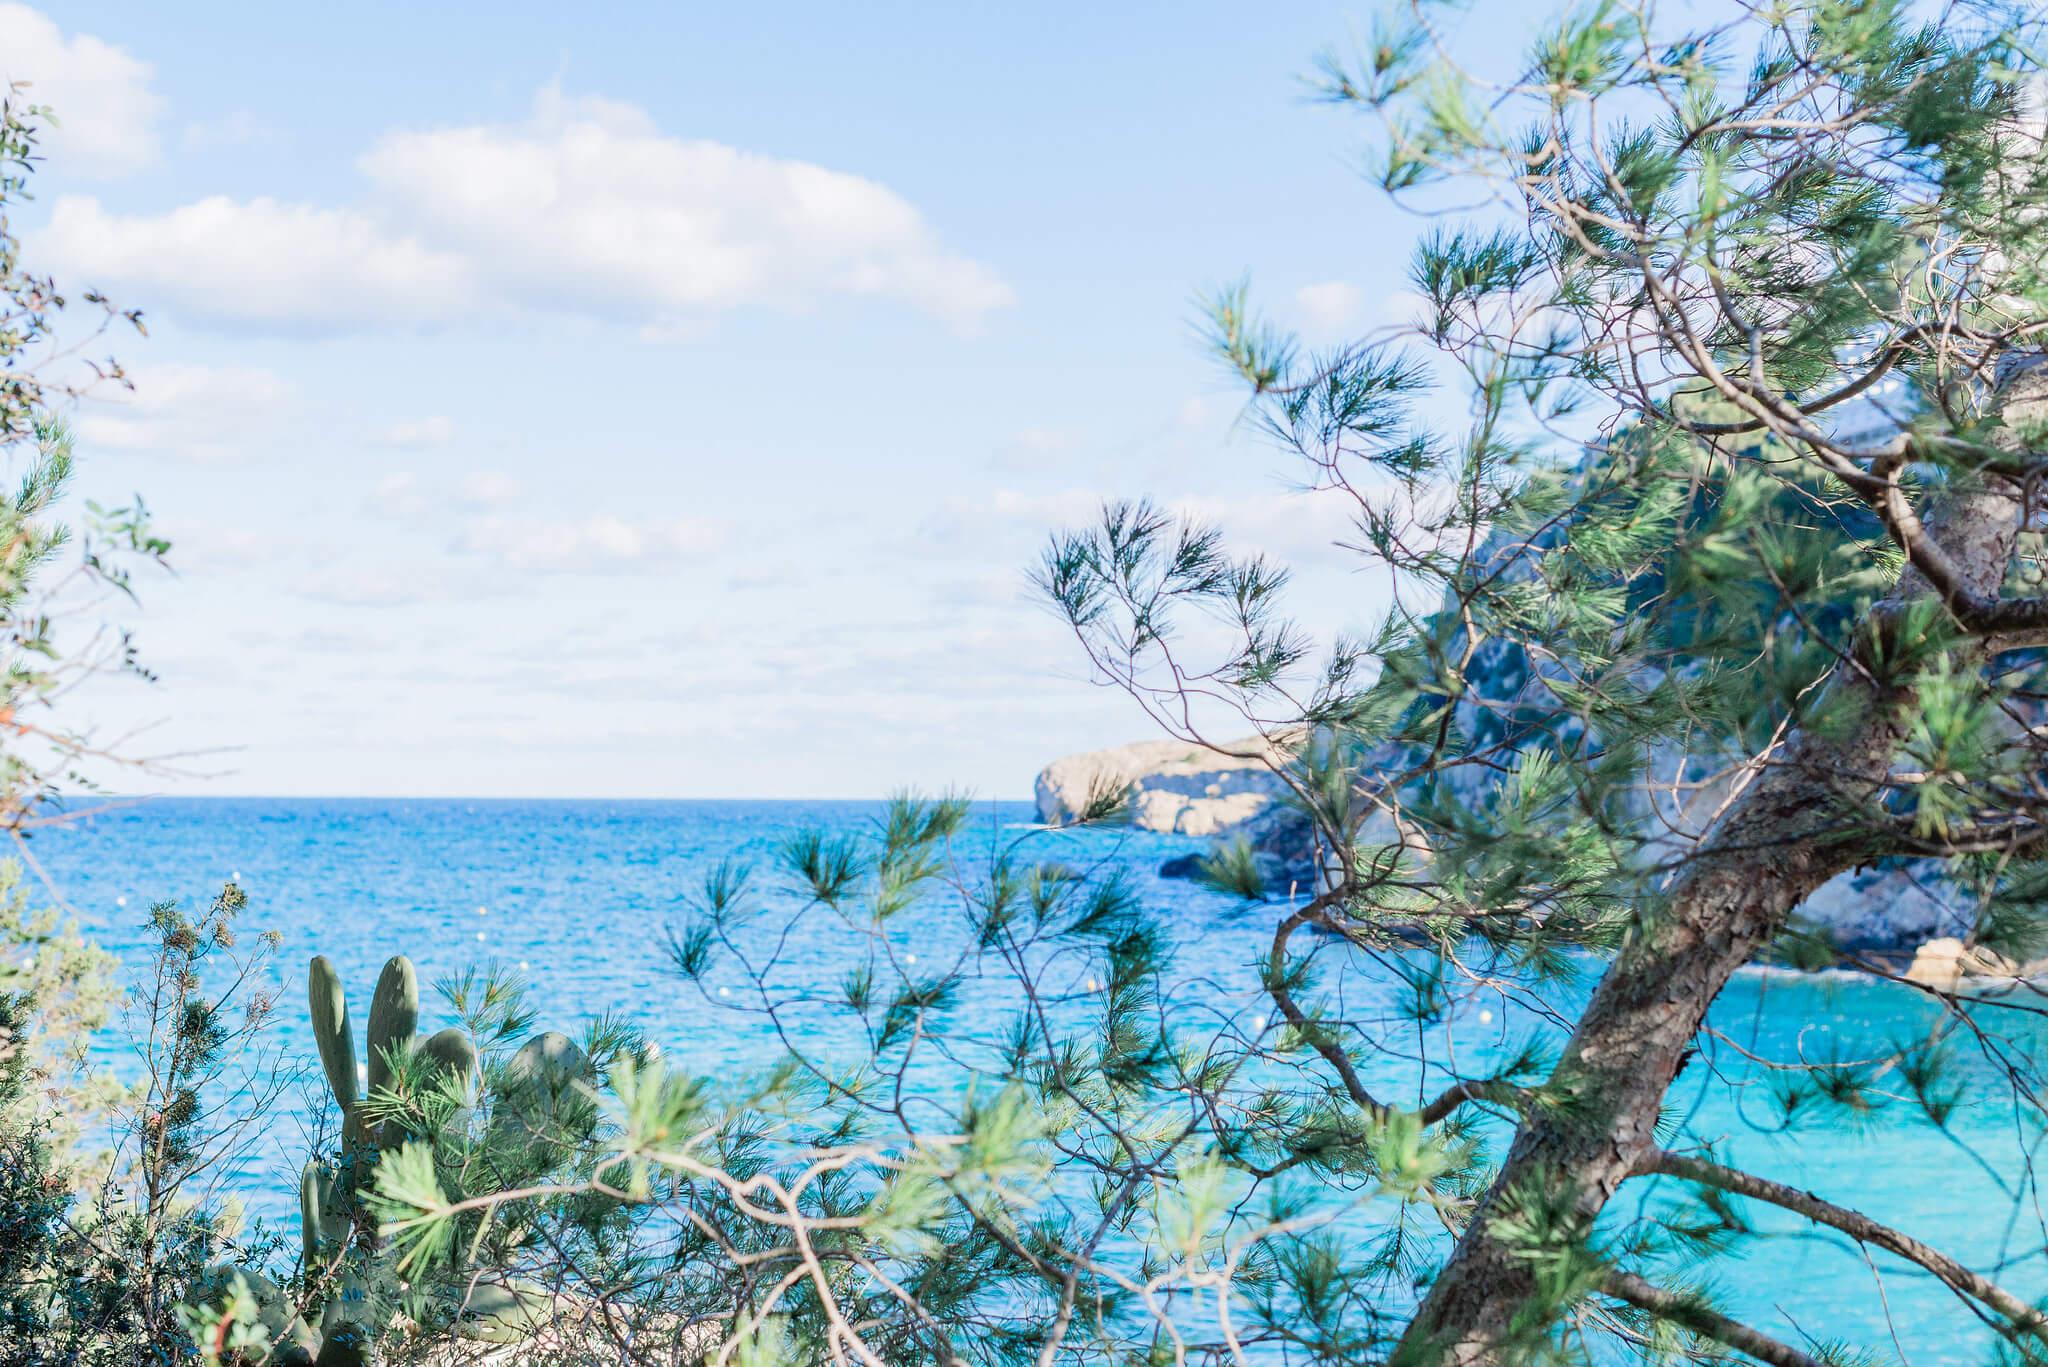 https://www.white-ibiza.com/wp-content/uploads/2020/03/ibiza-beaches-san-miguel-02.jpg